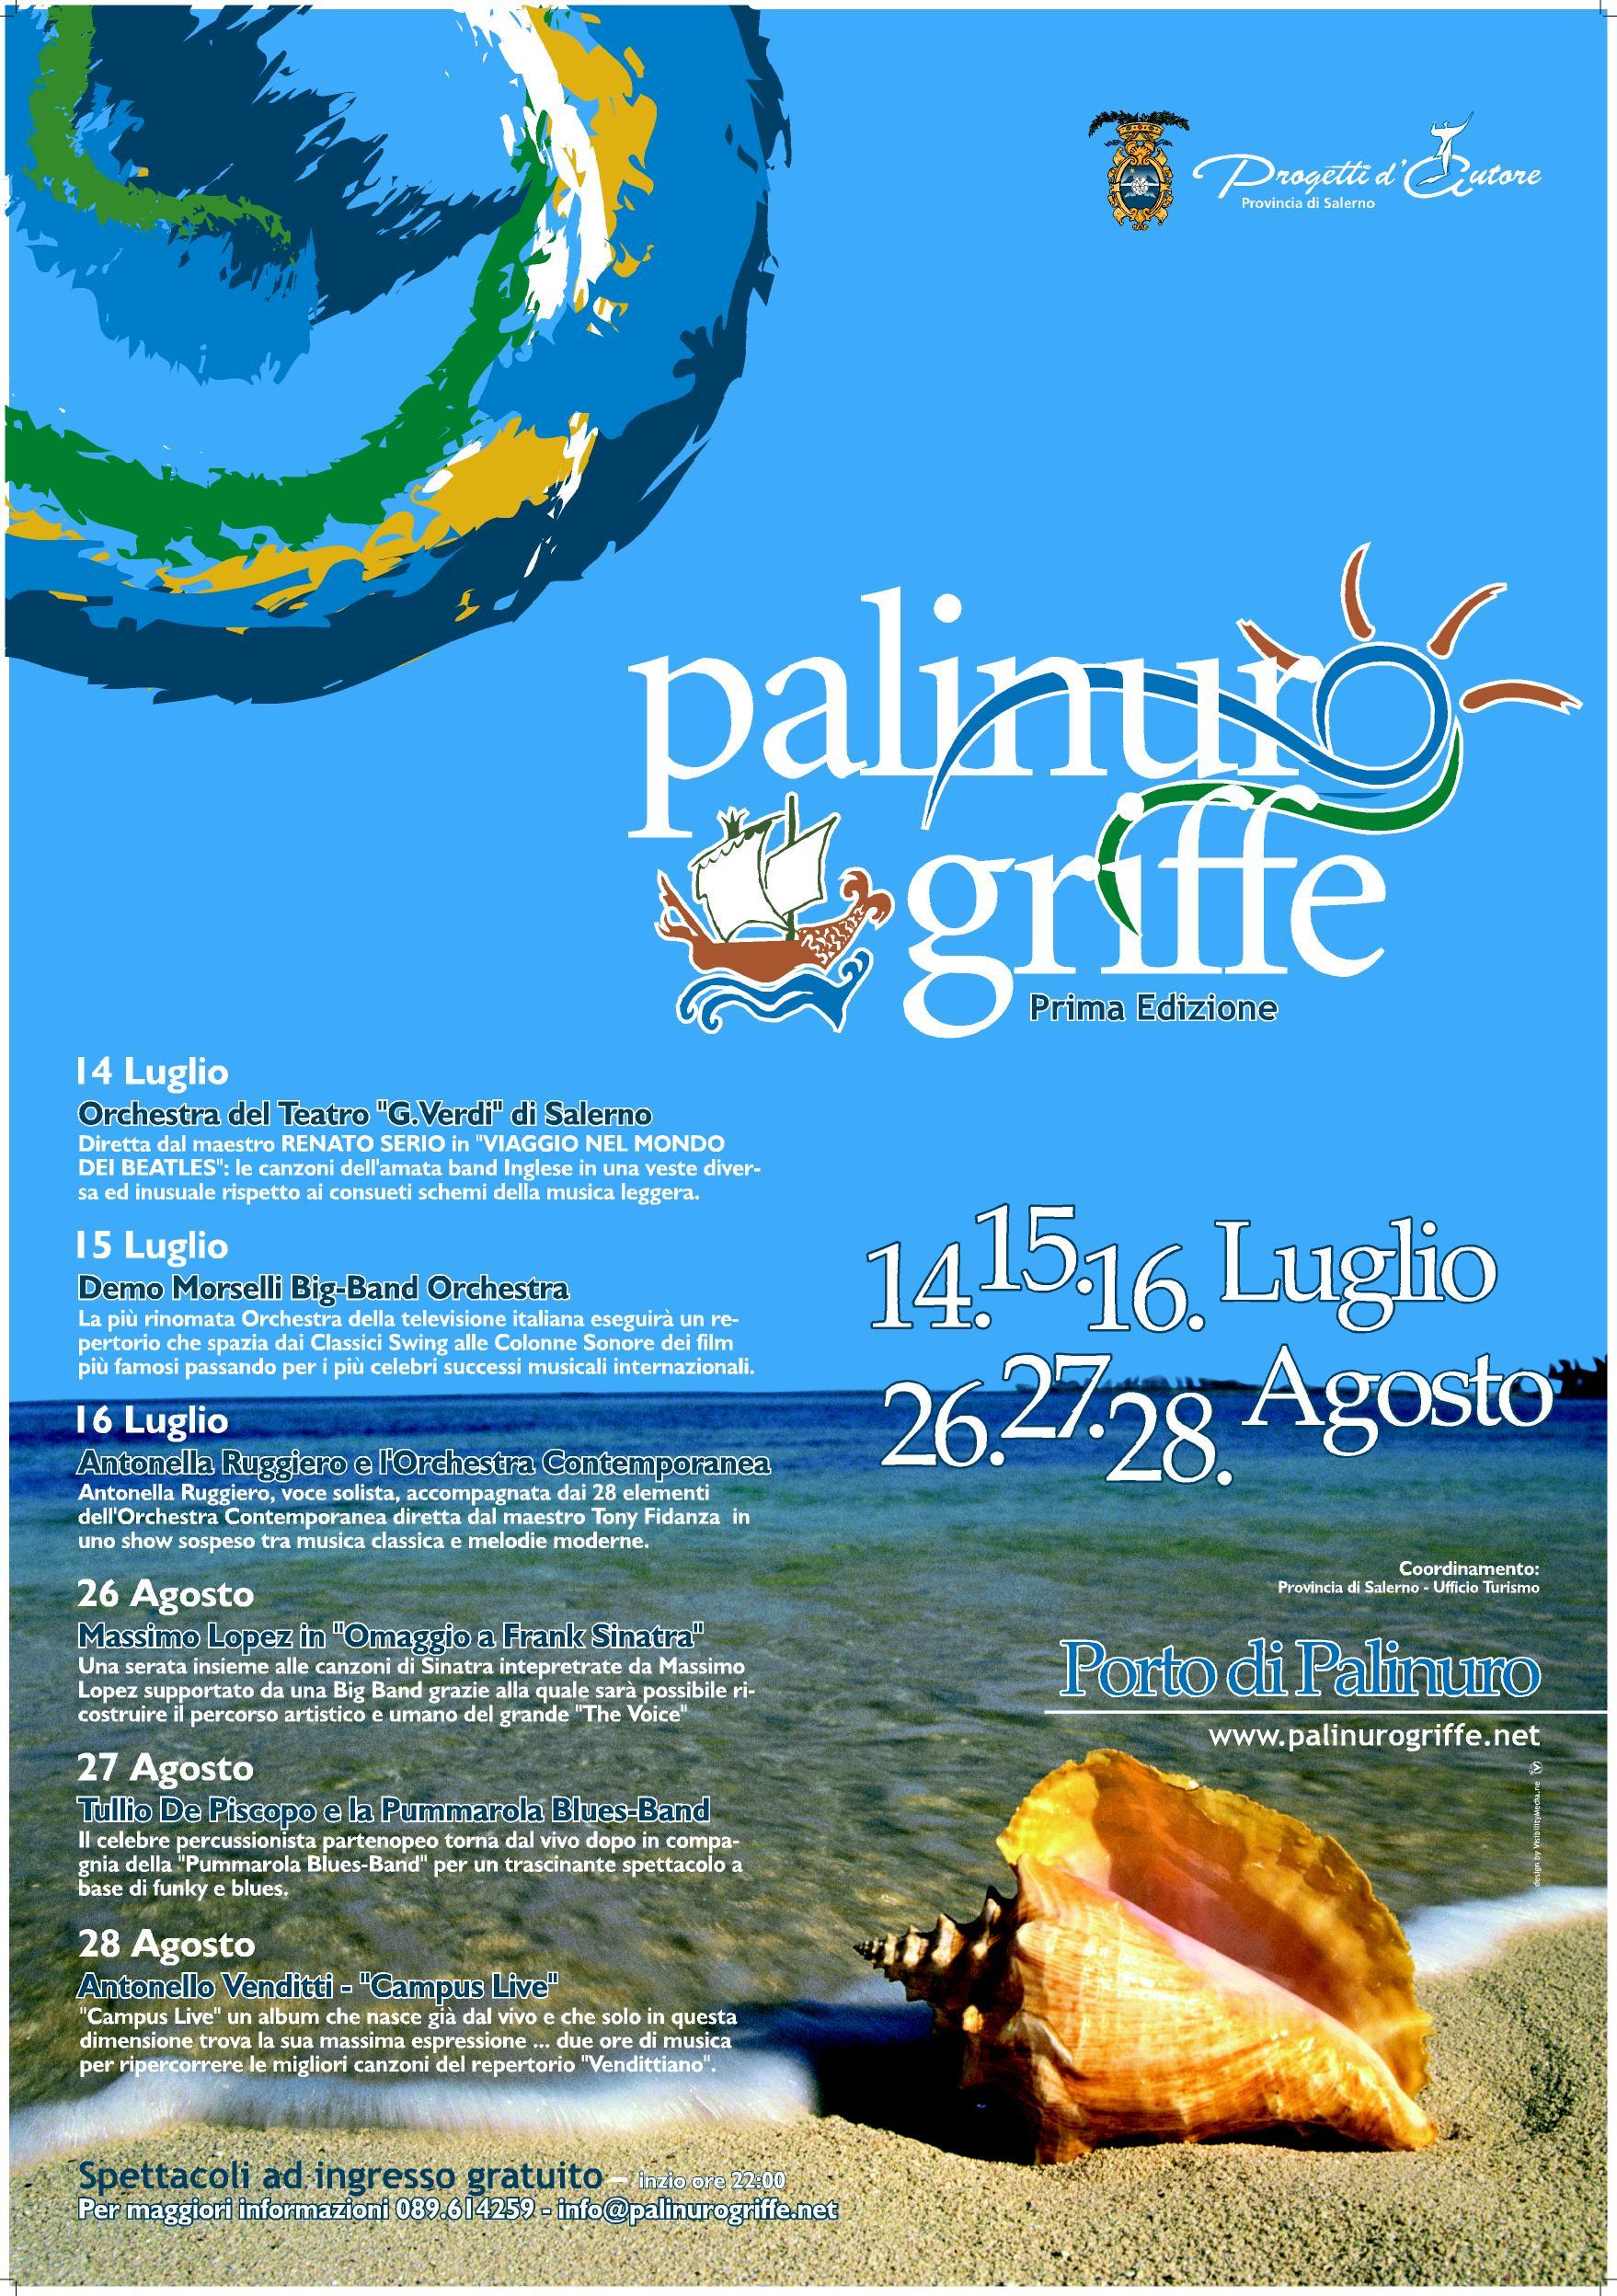 PALINURO GRIFFE